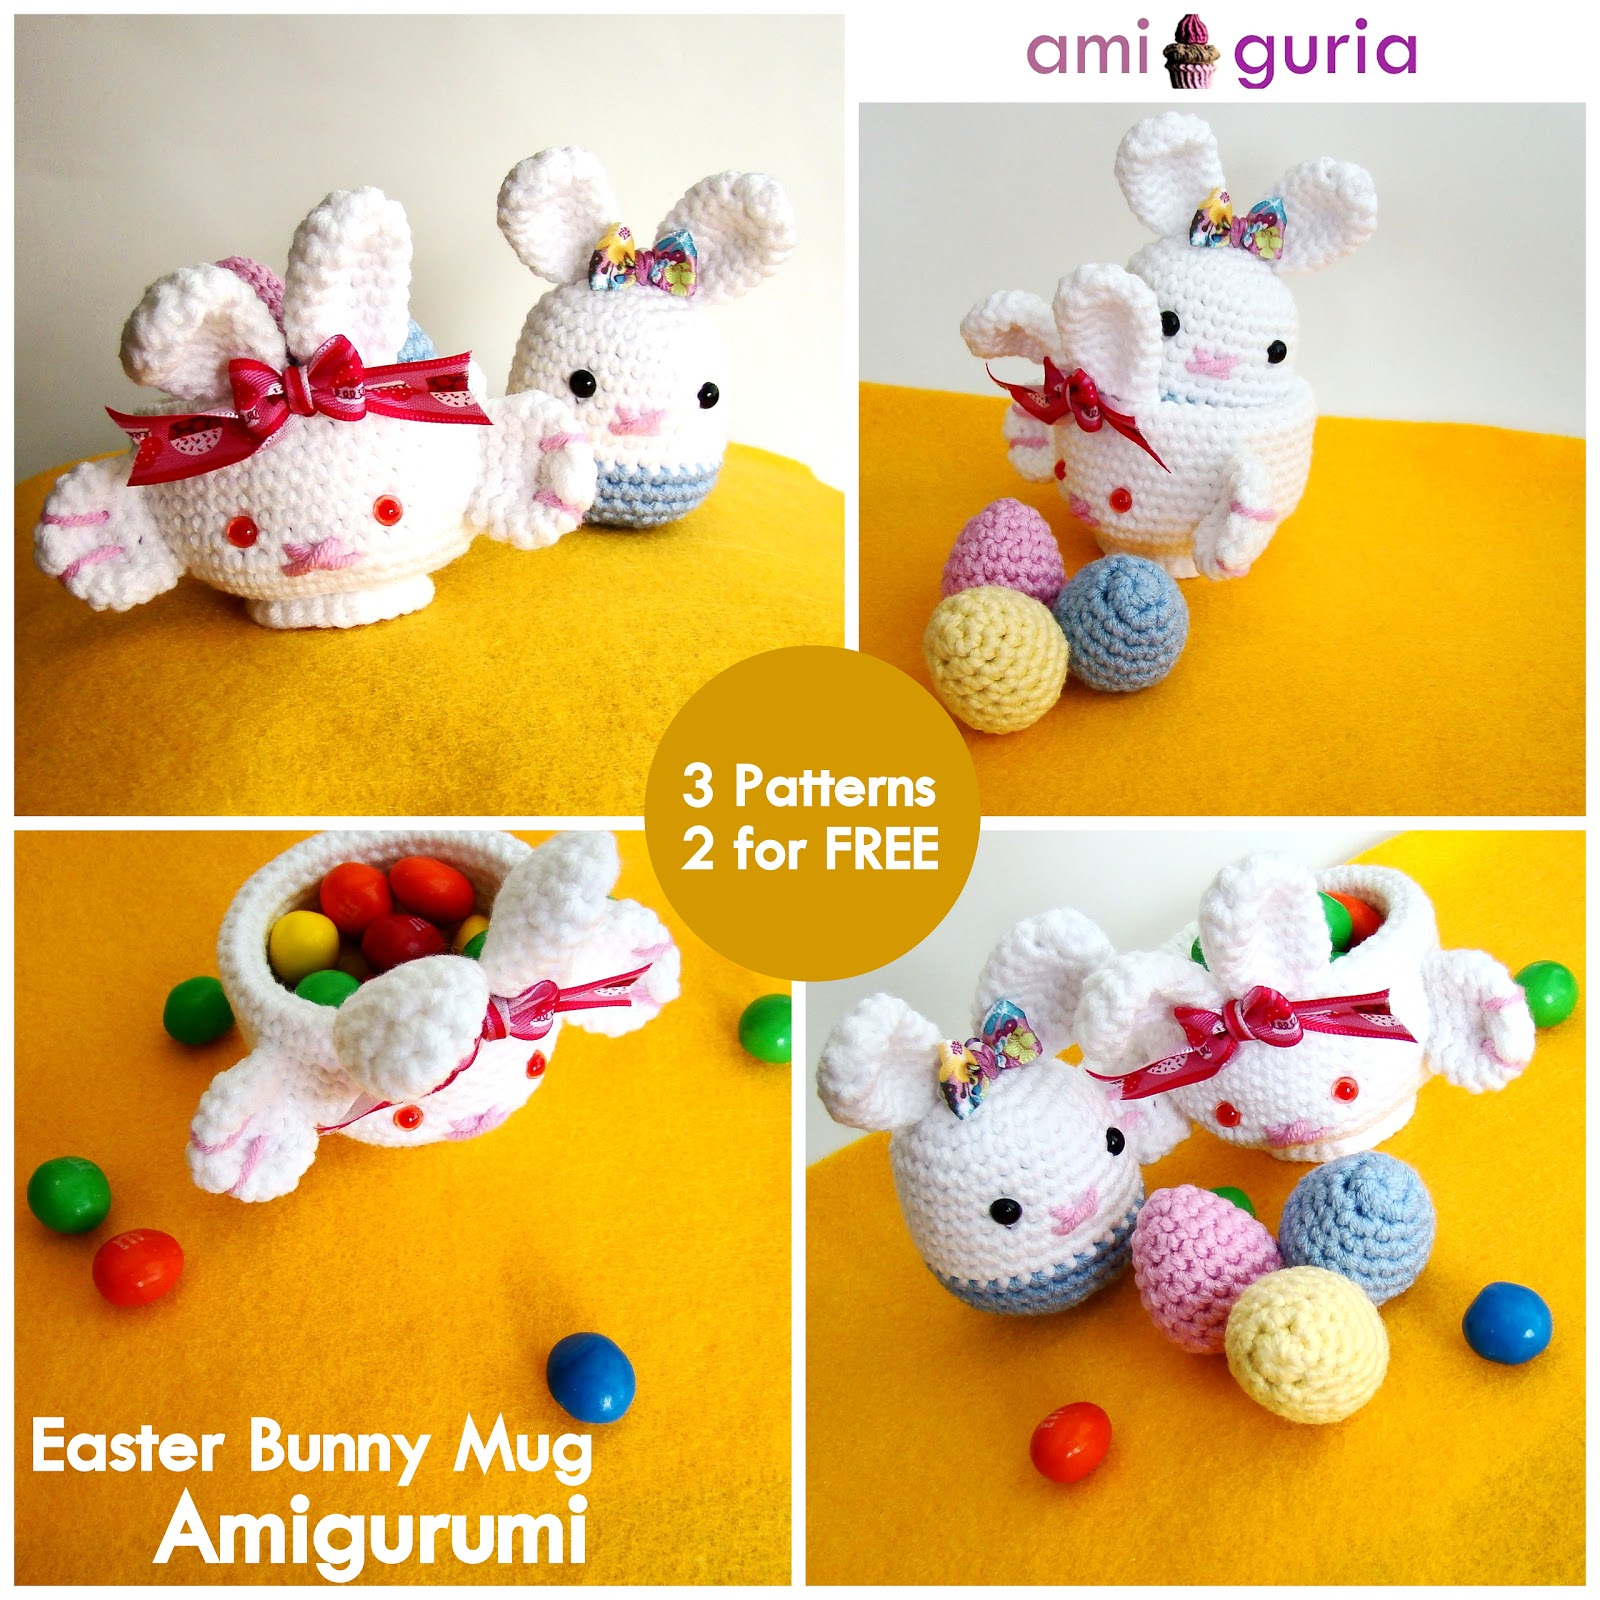 Amigurumi Easter Patterns : amiguria amigurumi: Easter Bunny Mug Amigurumi